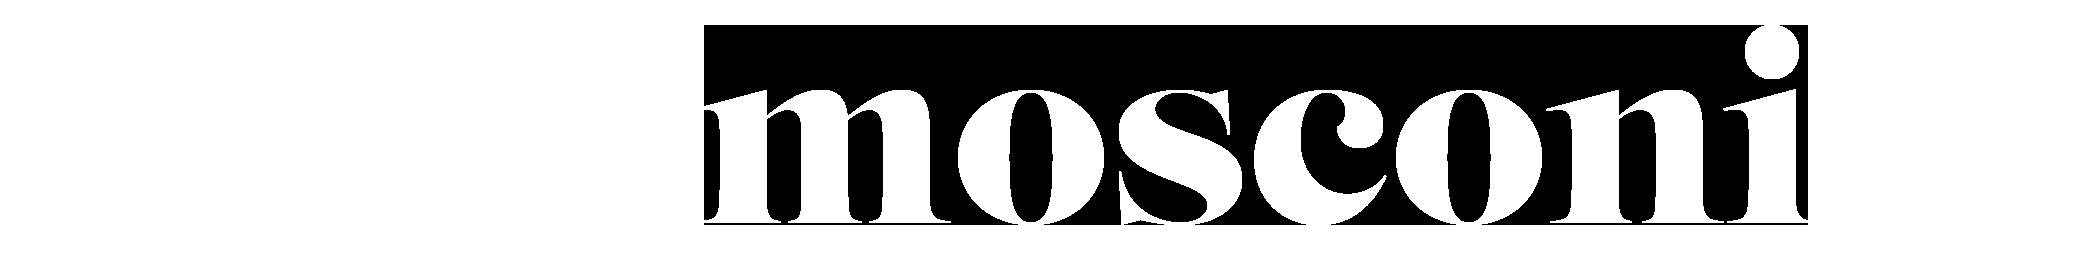 mosconi_logo.png